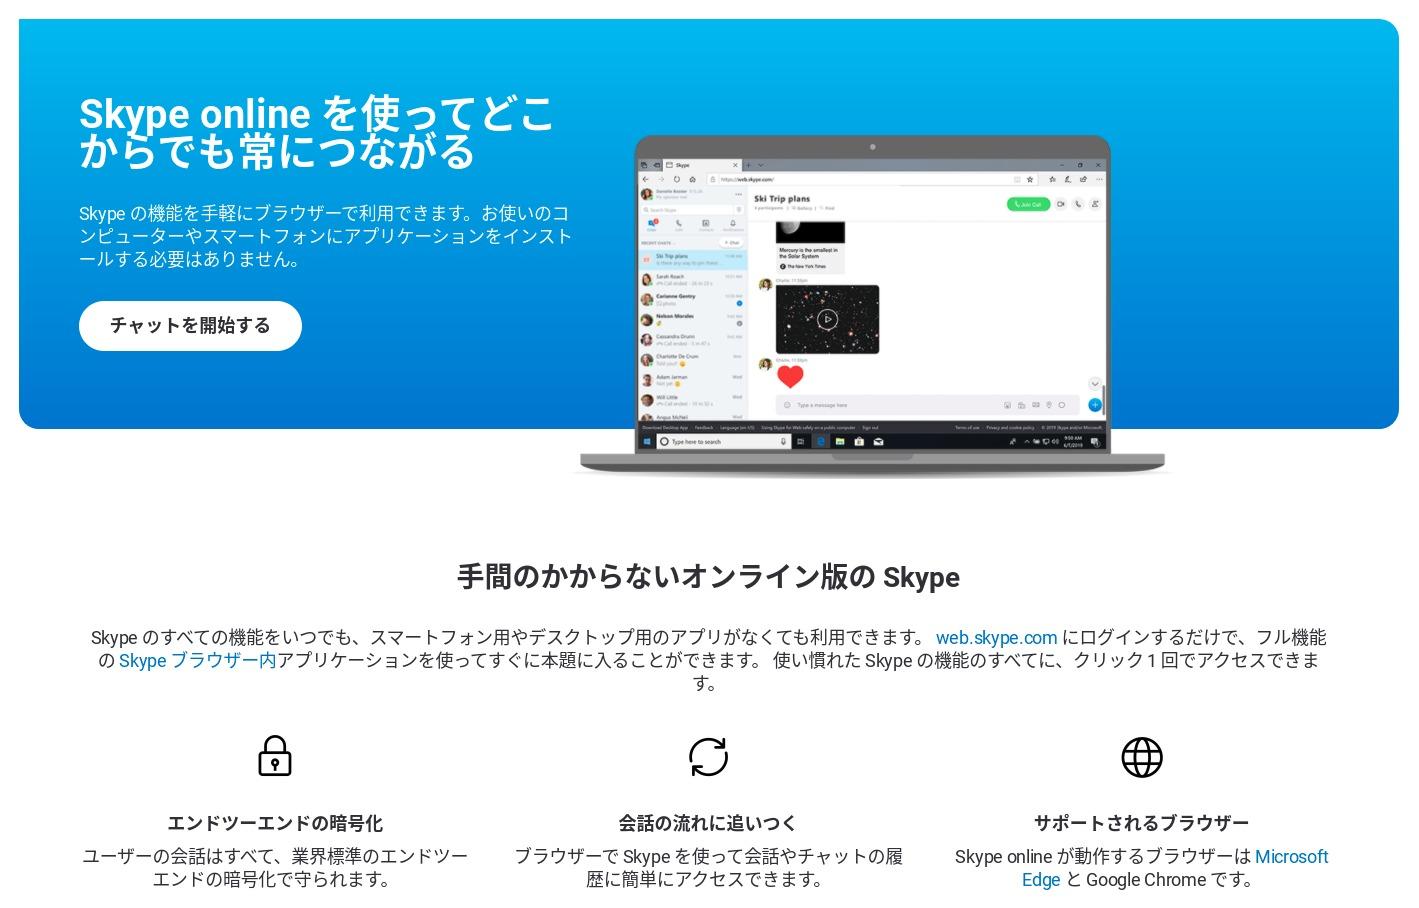 Skype online Windows7